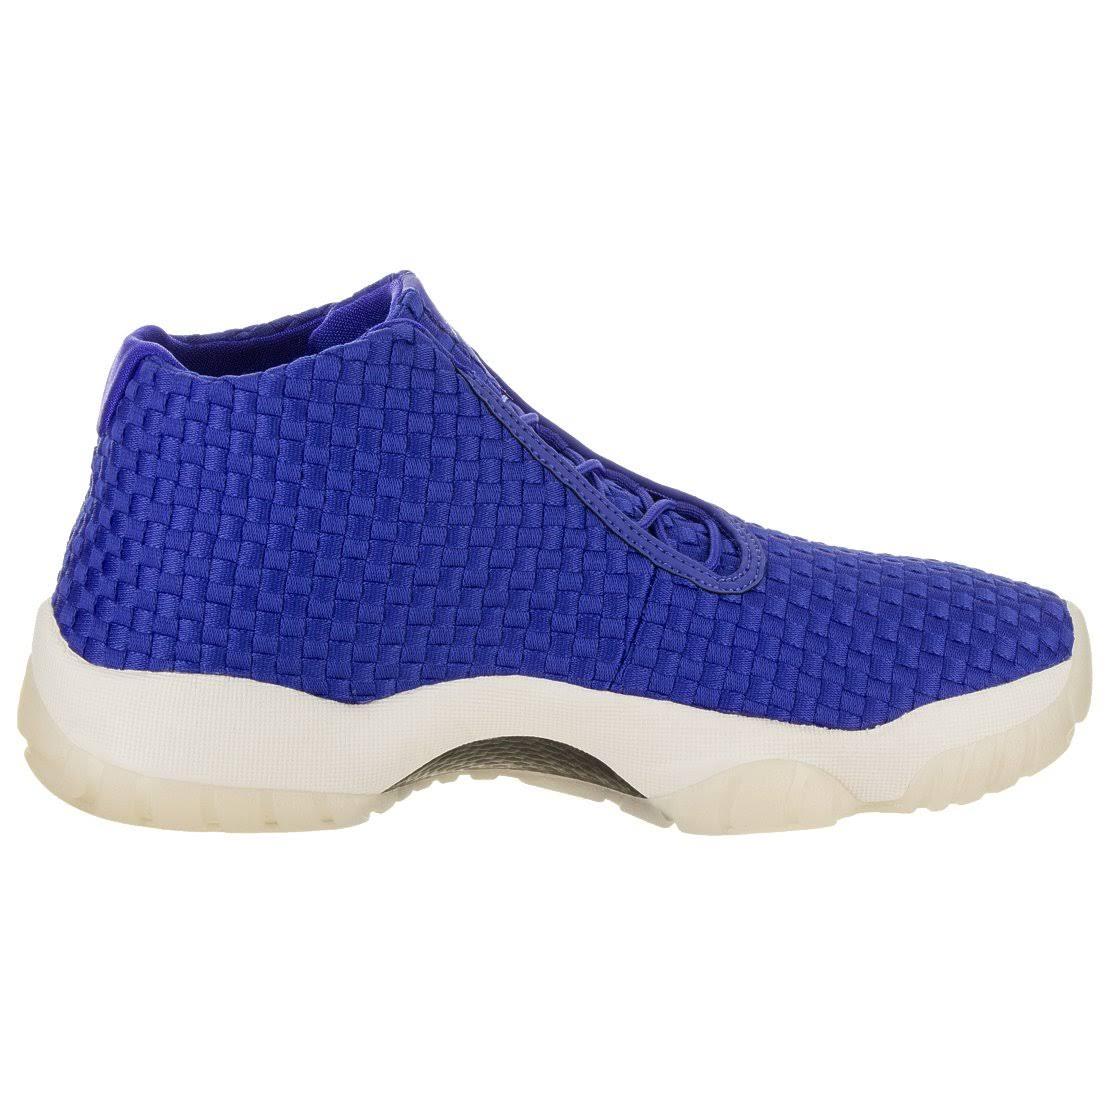 Jordan 14 Talla Para De hiper Hombre Future Zapatos Real Air 1aIaw